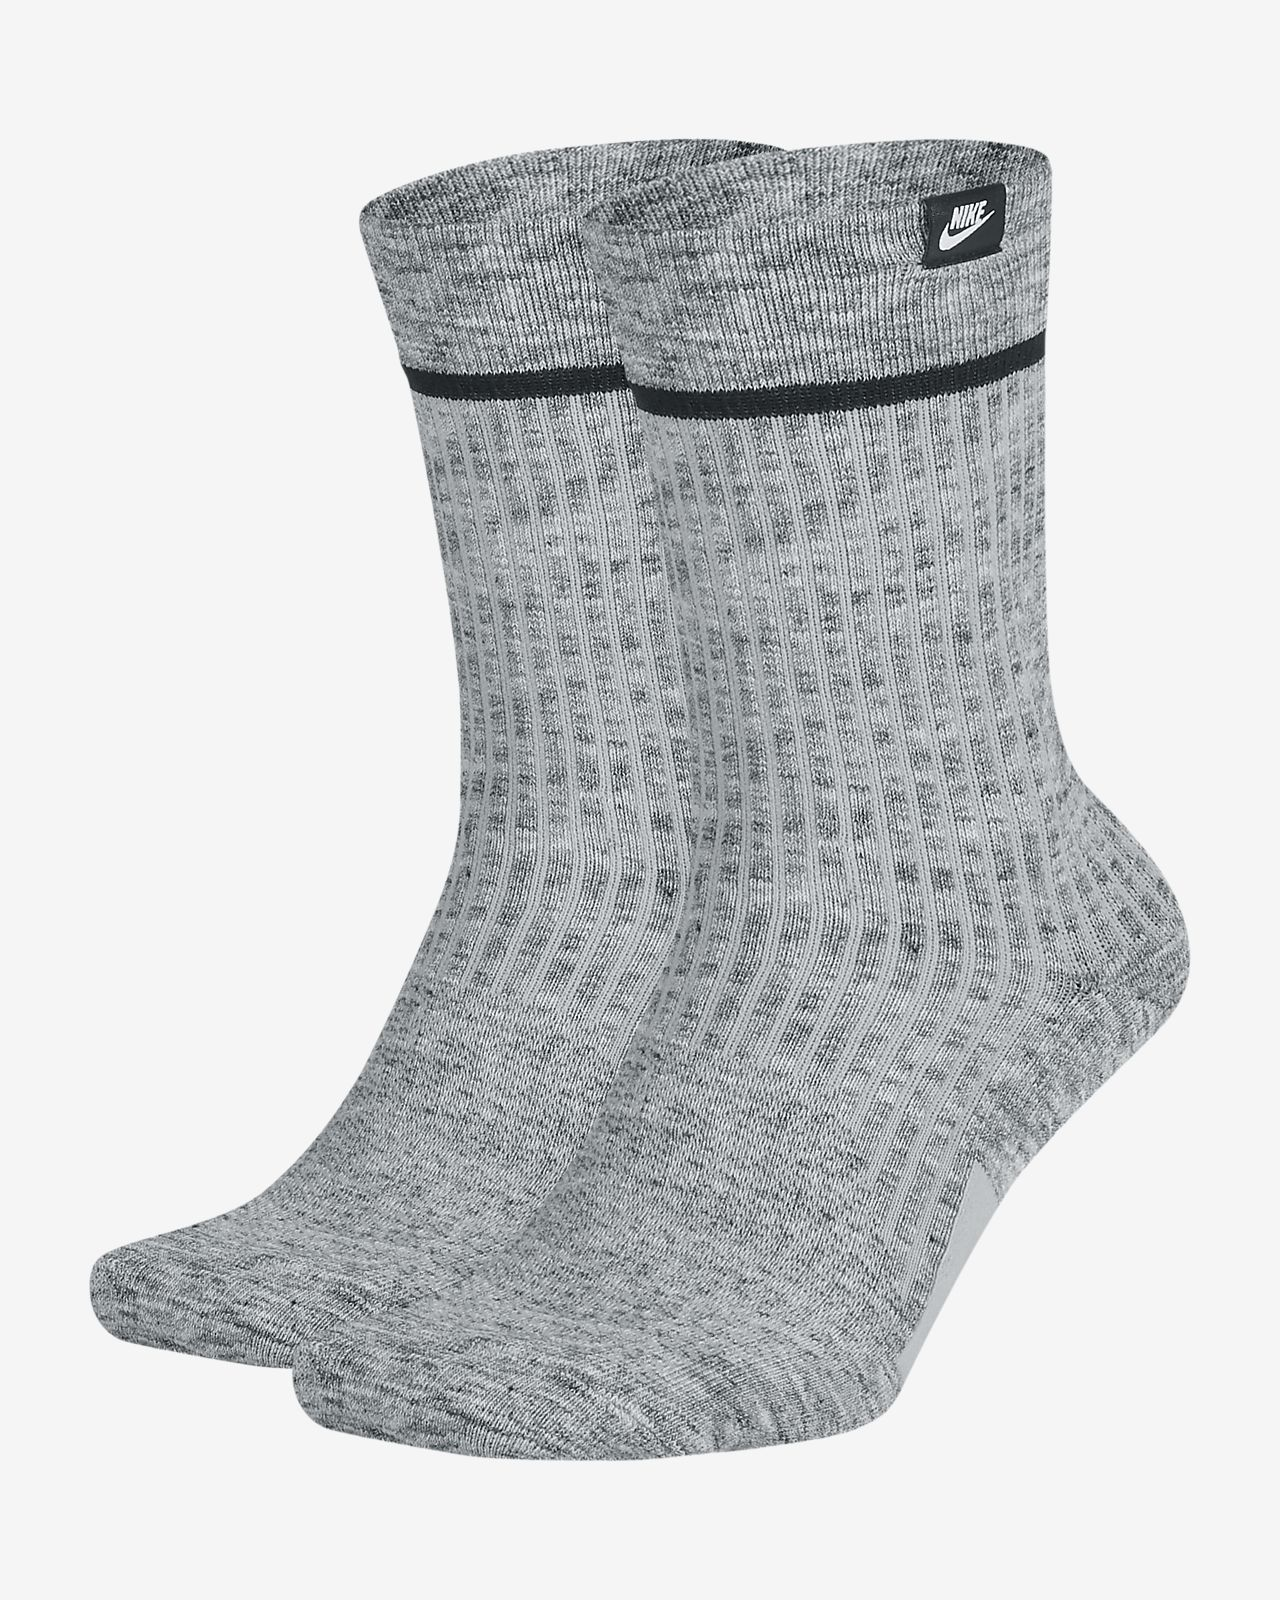 6c887490e Nike SNKR Sox Essential Crew Socks (2 Pairs). Nike.com